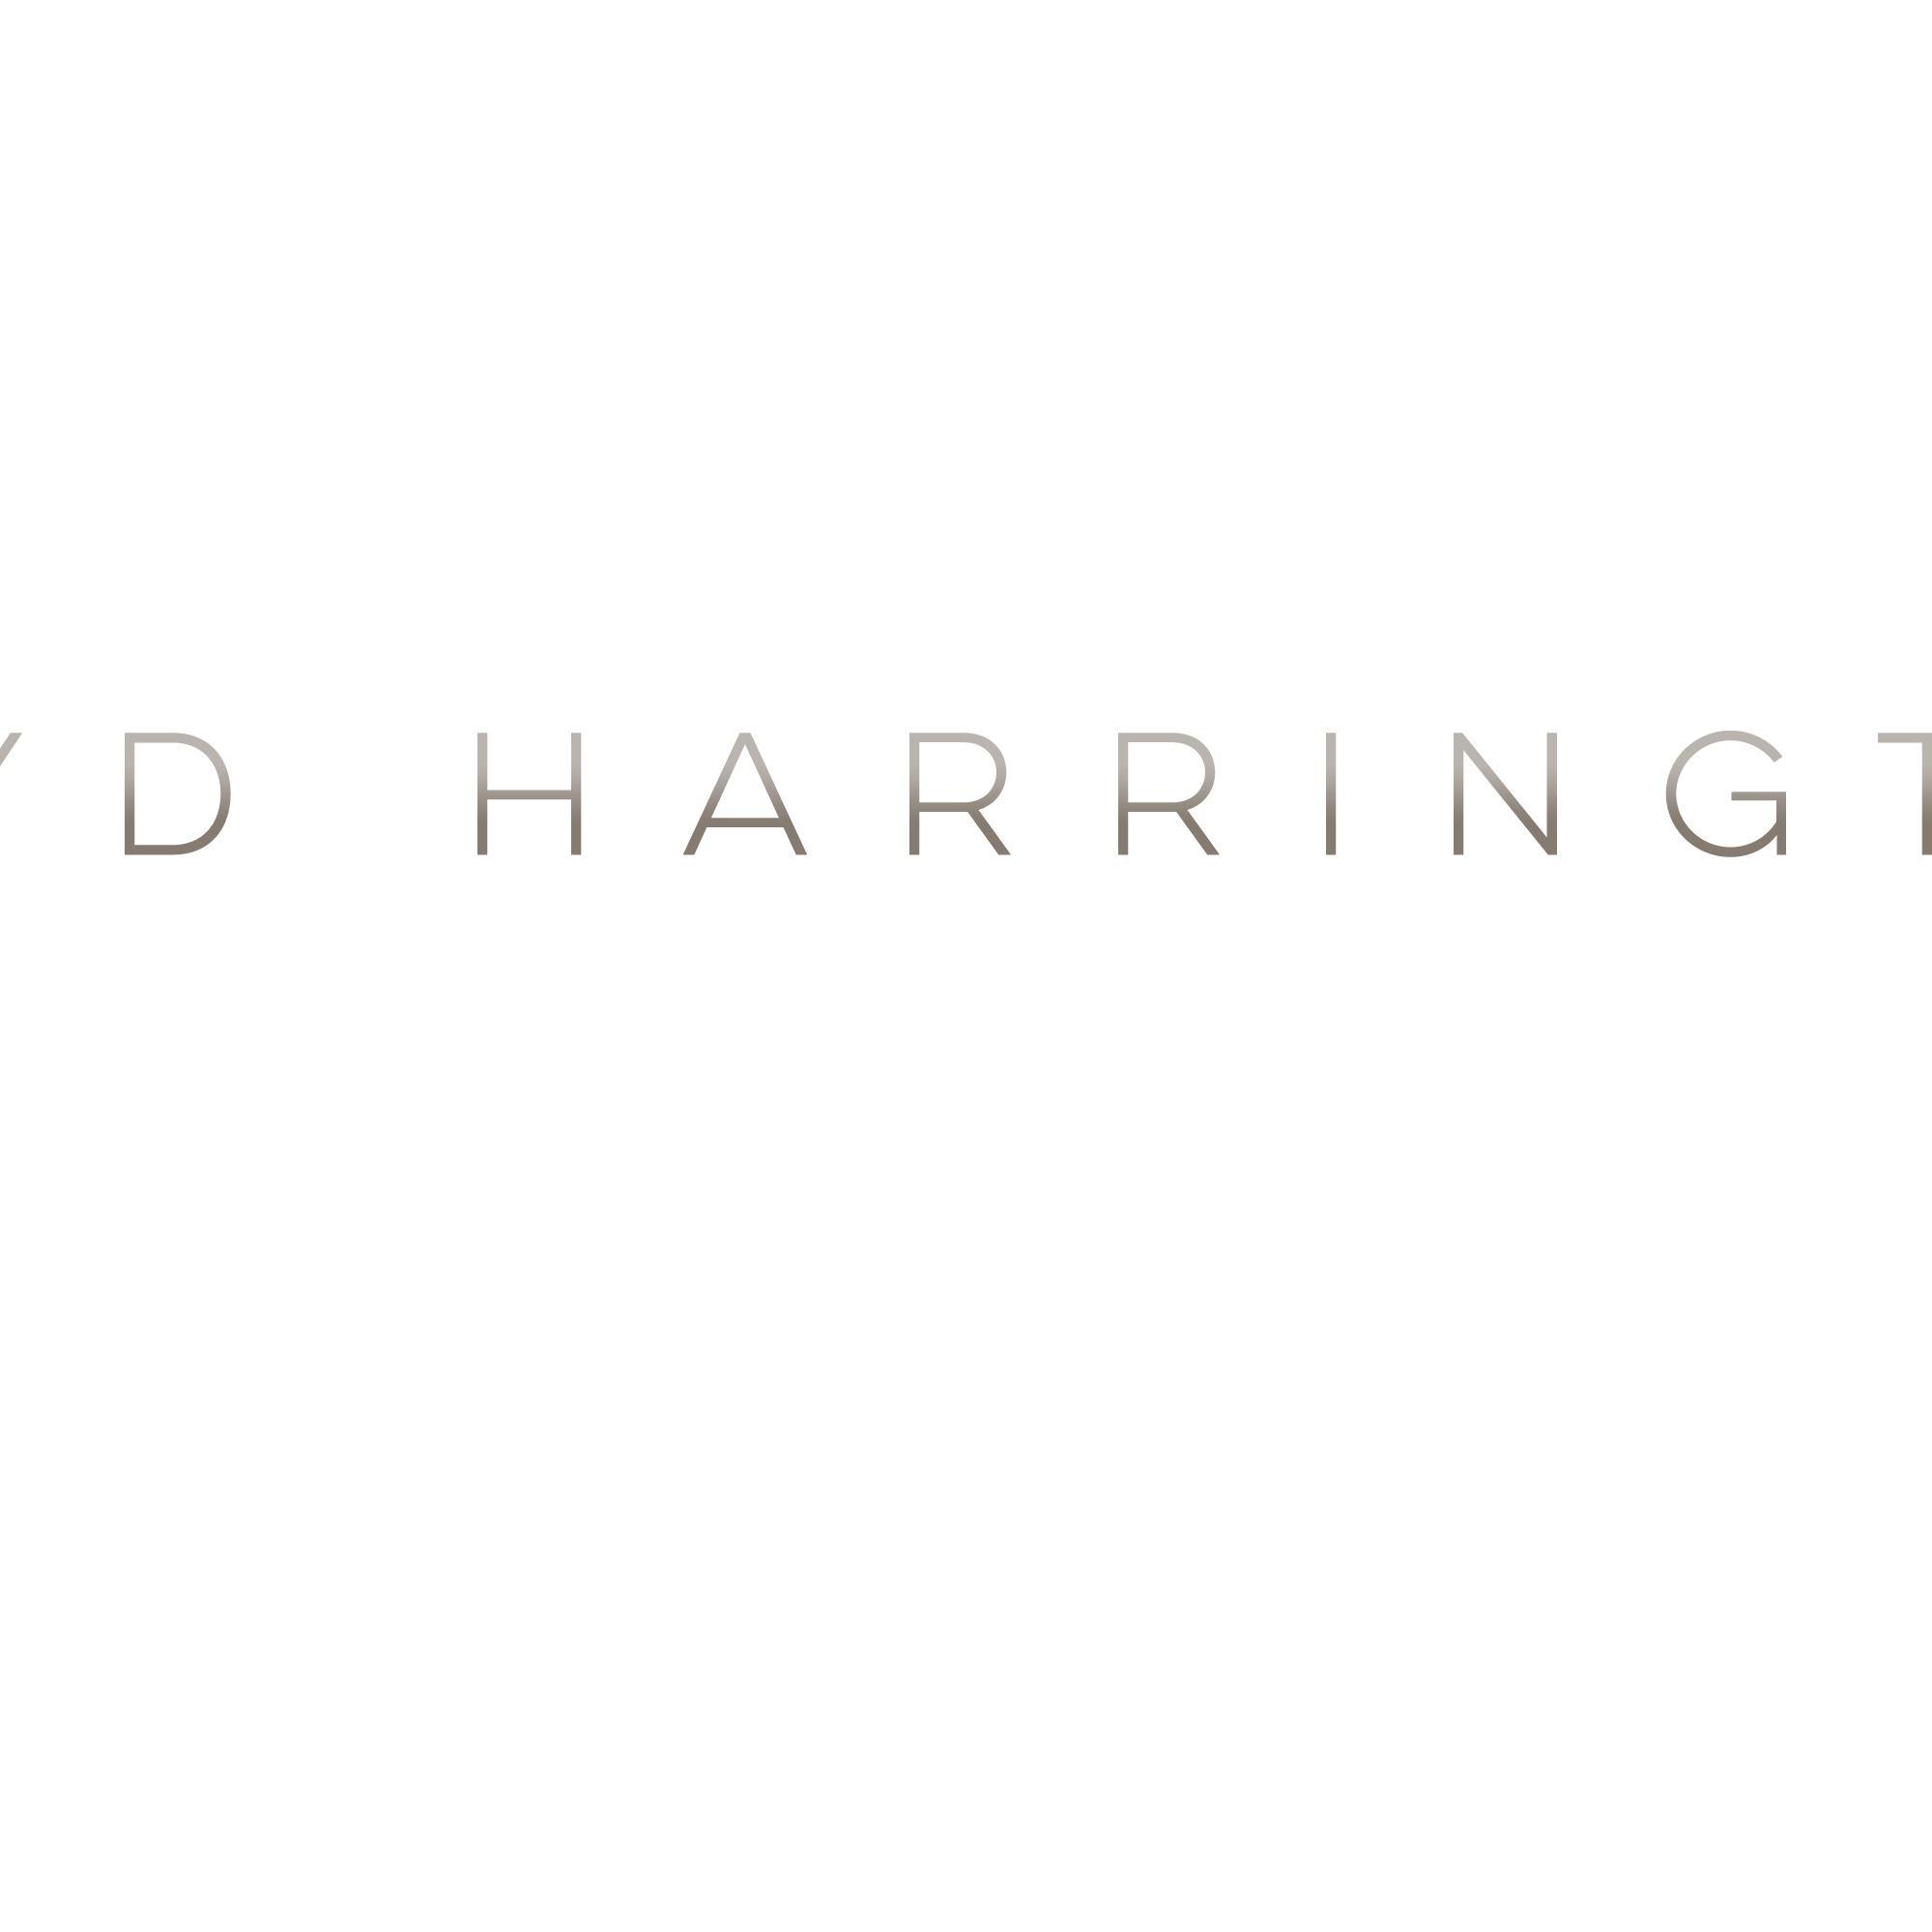 Boyd Harrington Cinematography & Videography